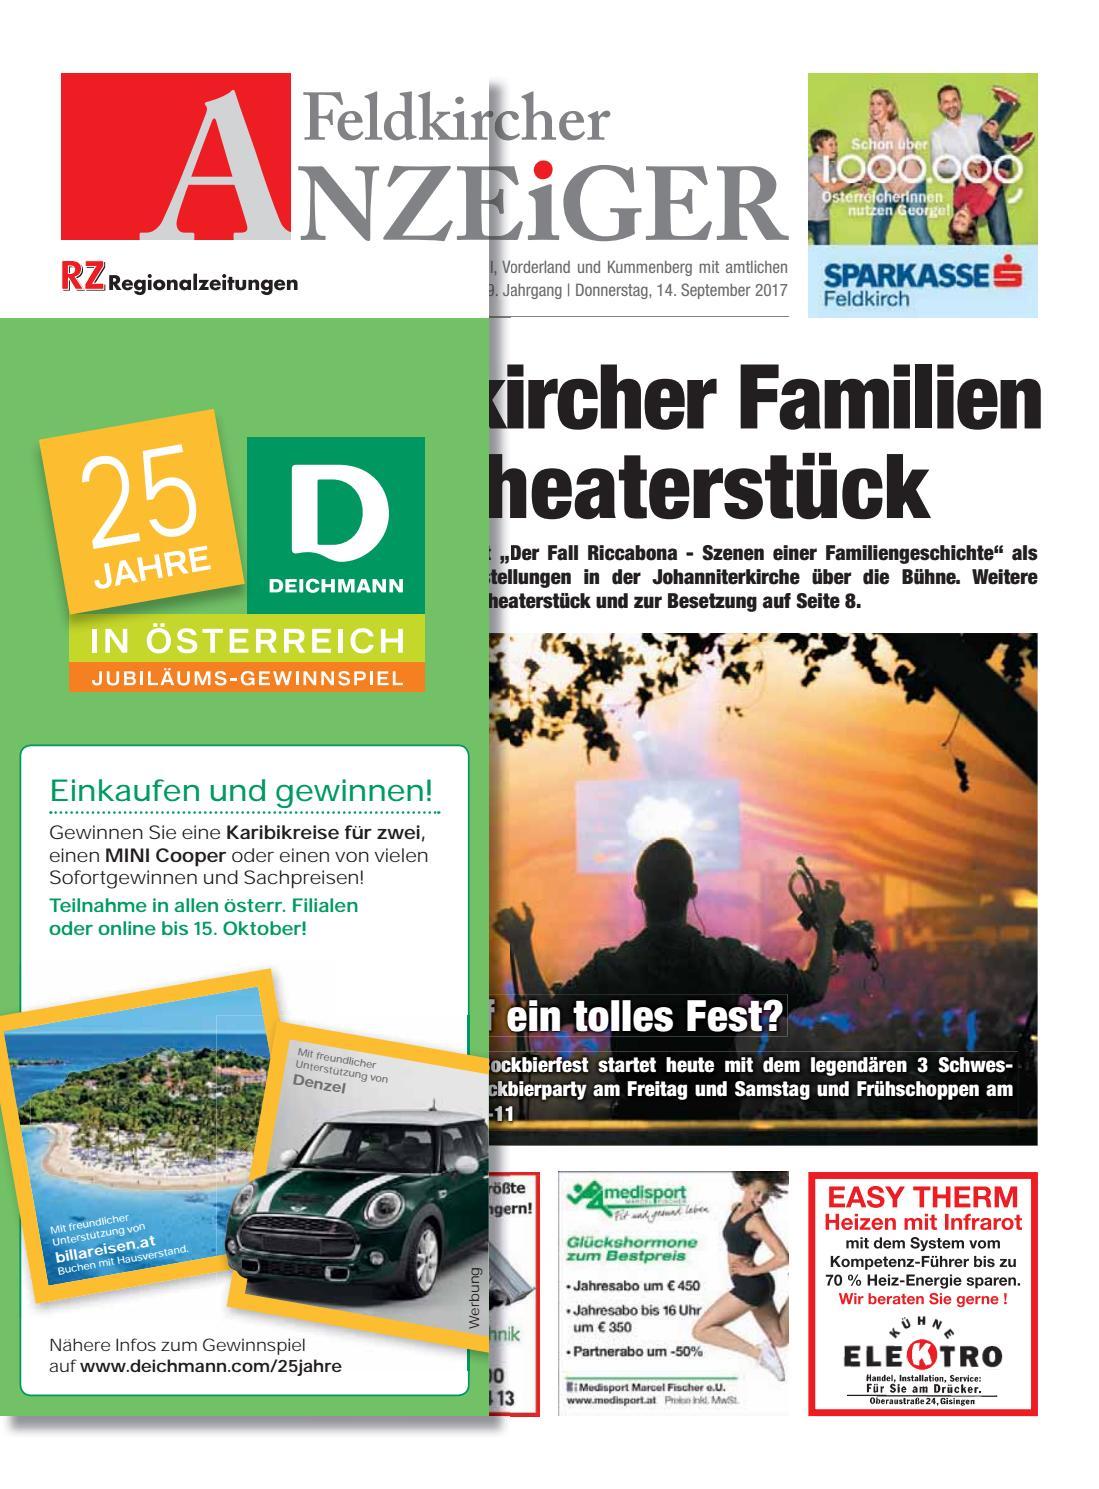 Freundschaft & Unternehmungen in Feldkirch